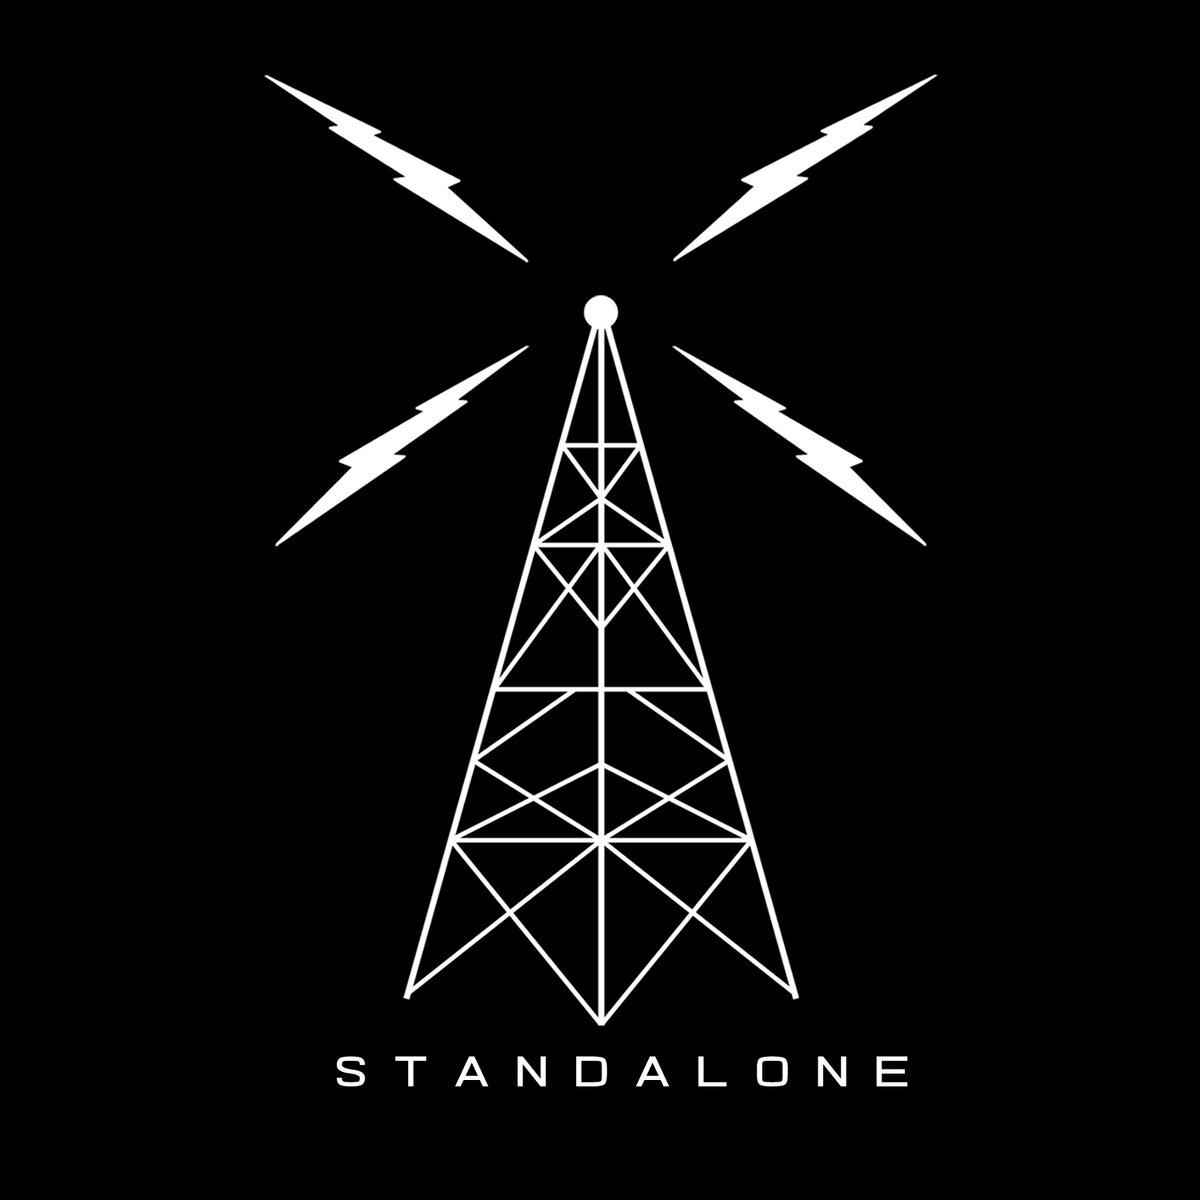 Standalone, self-titled